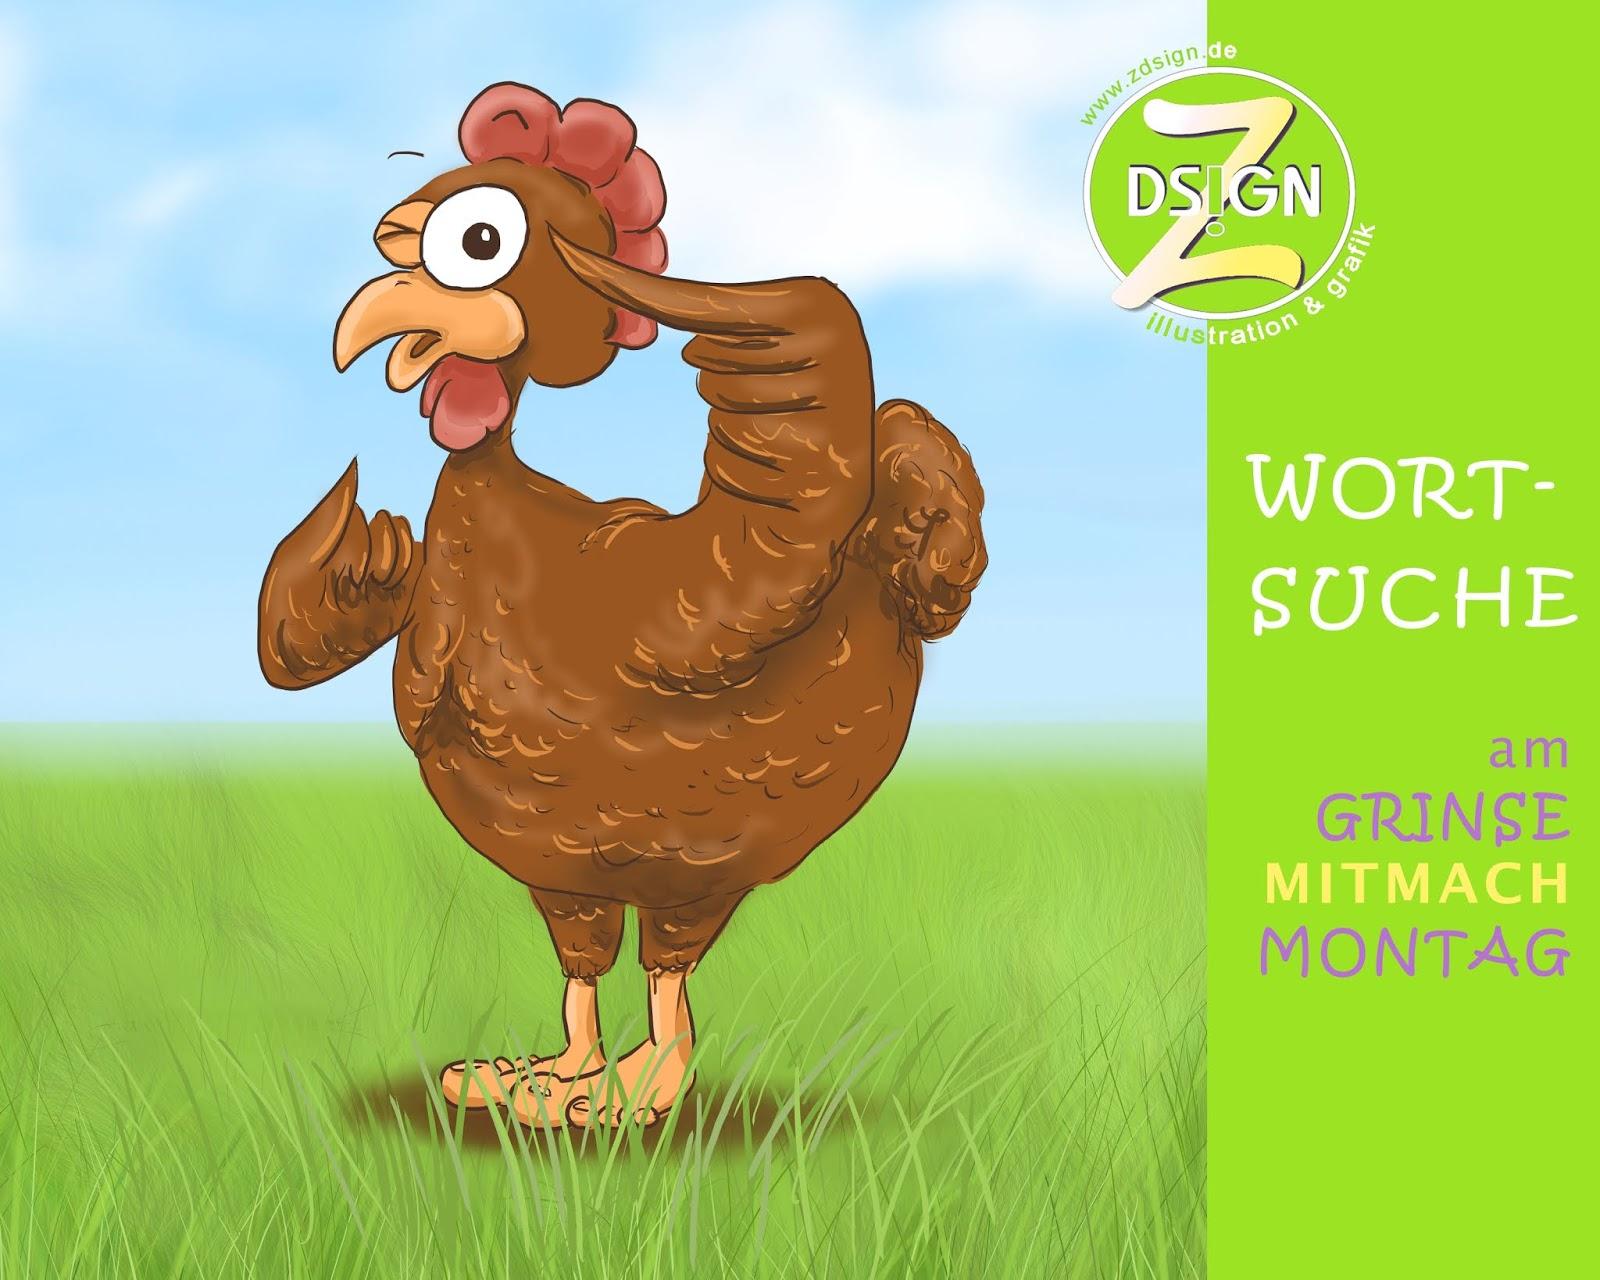 Hühnerauge-Podologie-Fußpflege-zdsign-Iris-Zeh-Illustrator